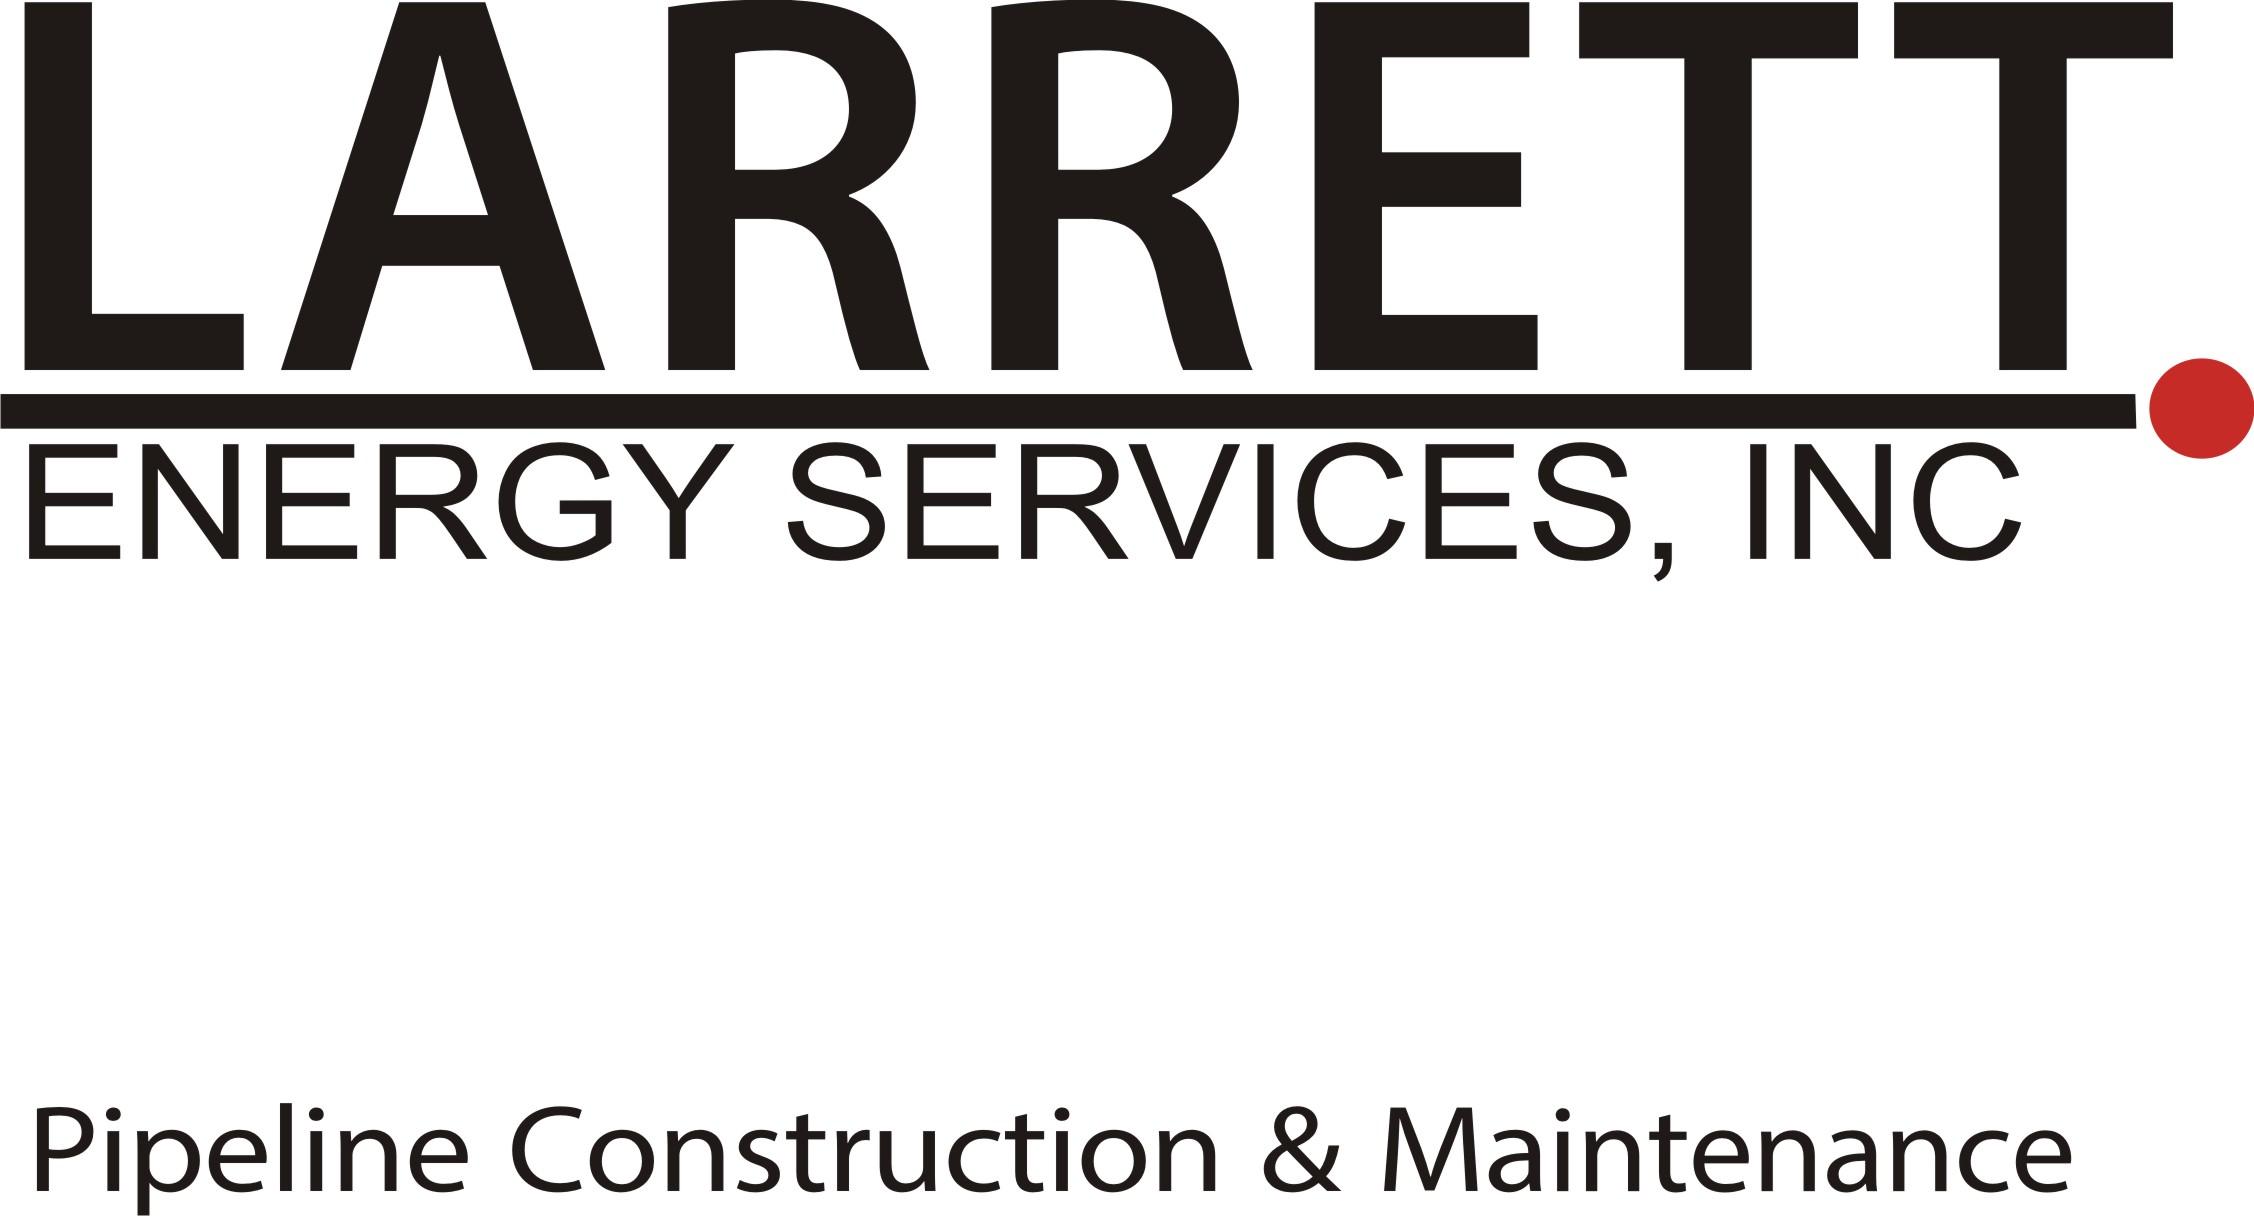 Larrett logo (002)